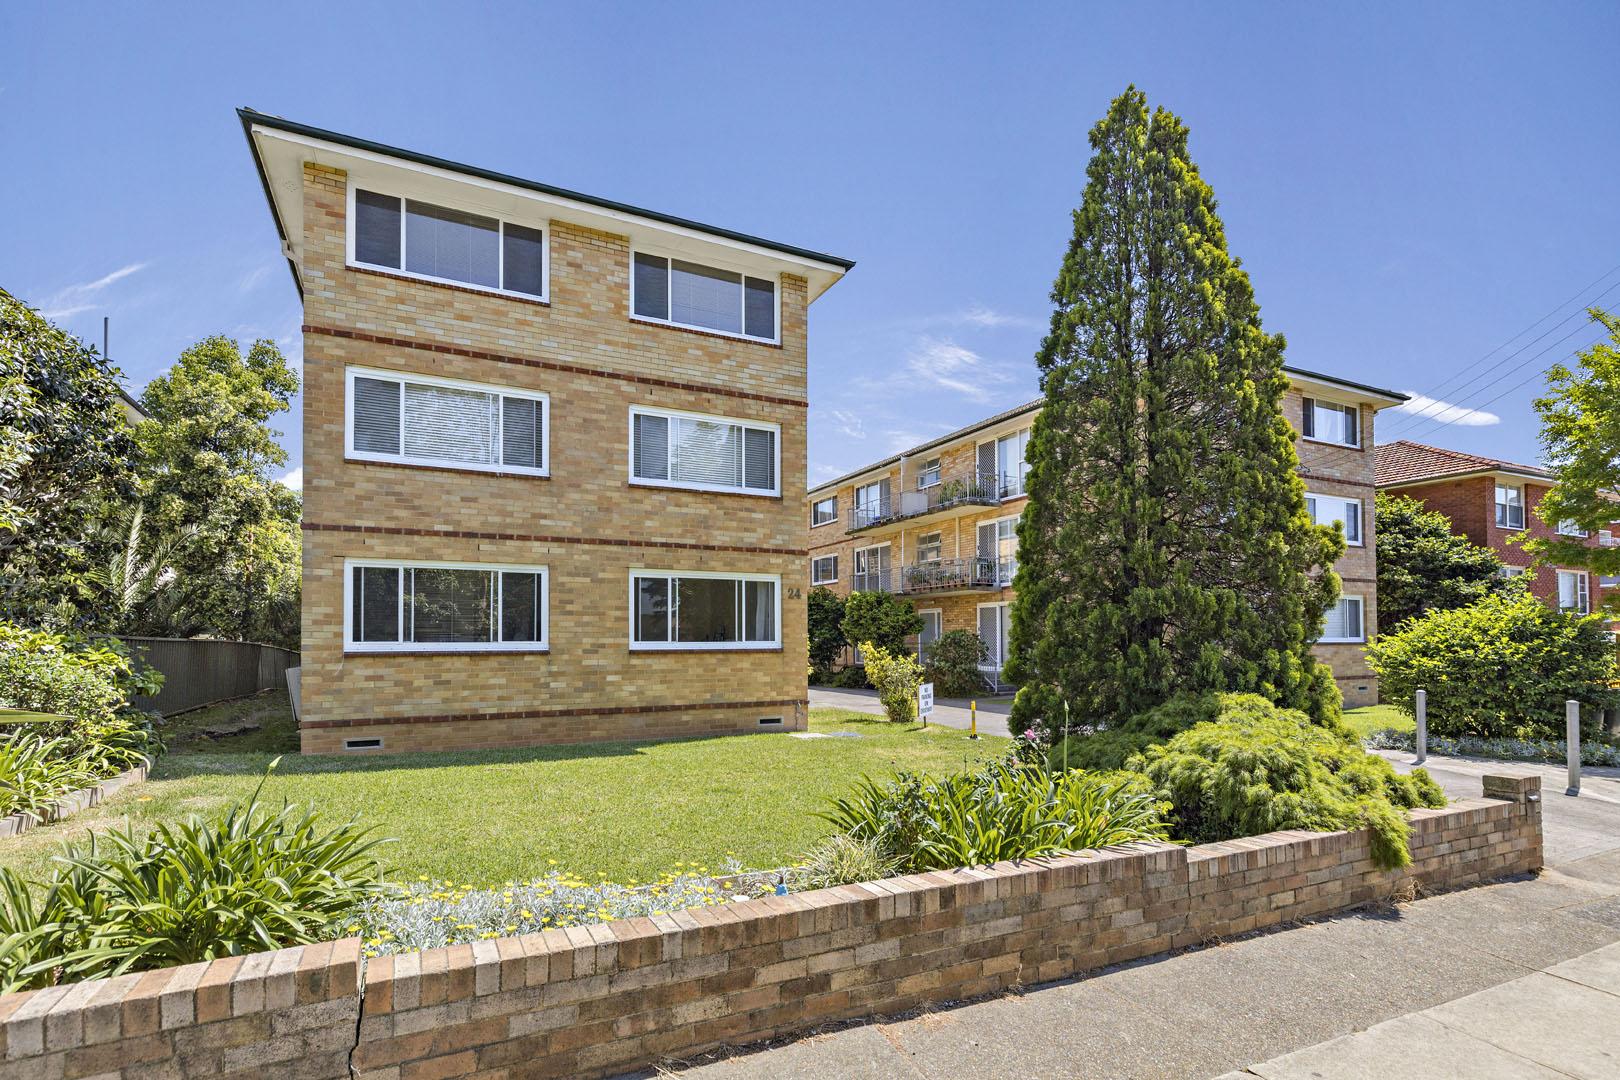 6/24 Chandos Street, Ashfield, NSW, 2131 - Image 1